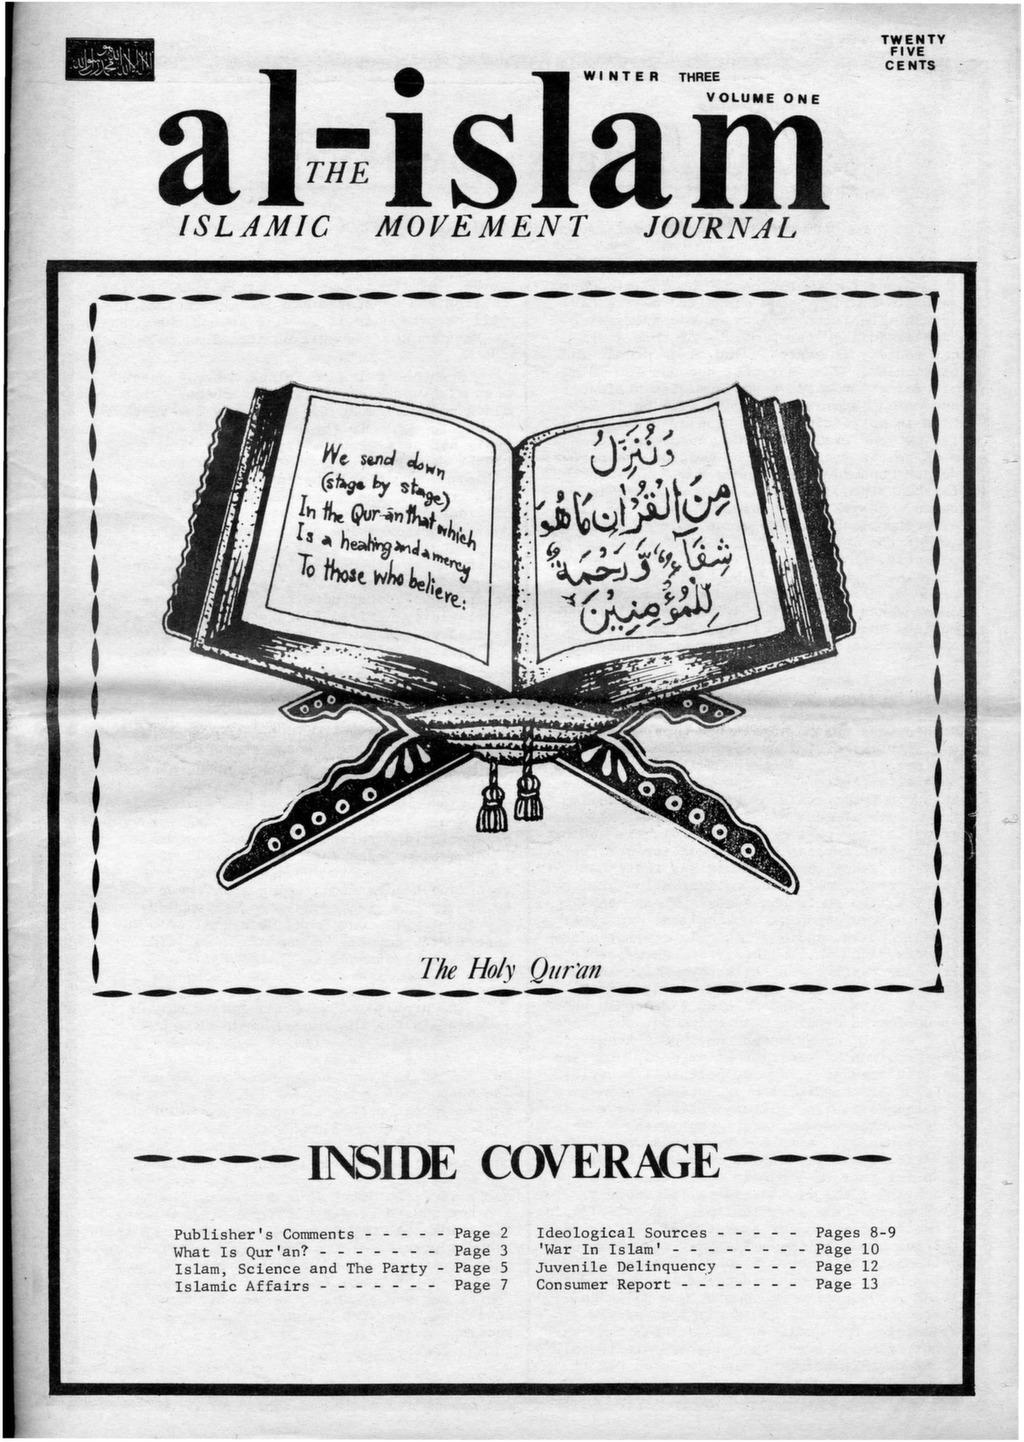 Al-Islam, 1972, Vol  1, Winter 3 - After Malcolm